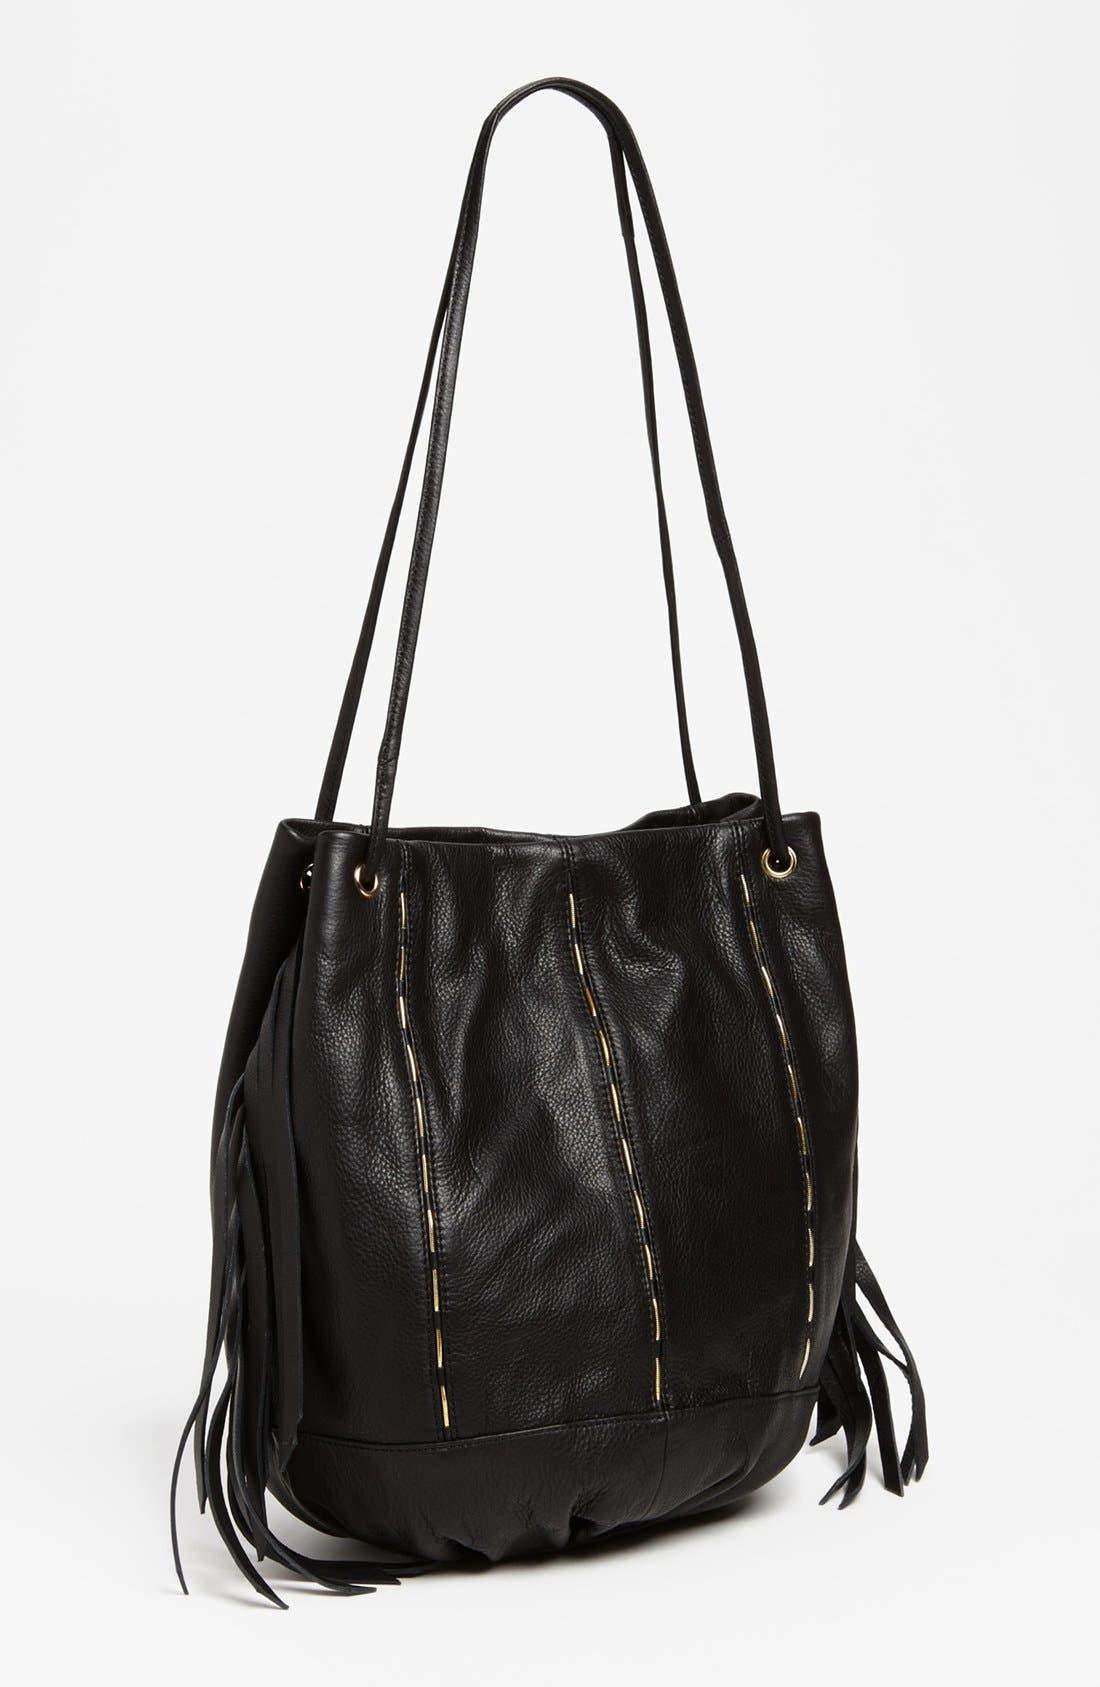 KELSI DAGGER BROOKLYN Kelsi Dagger 'Charlie' Drawstring Bag, Main, color, 001